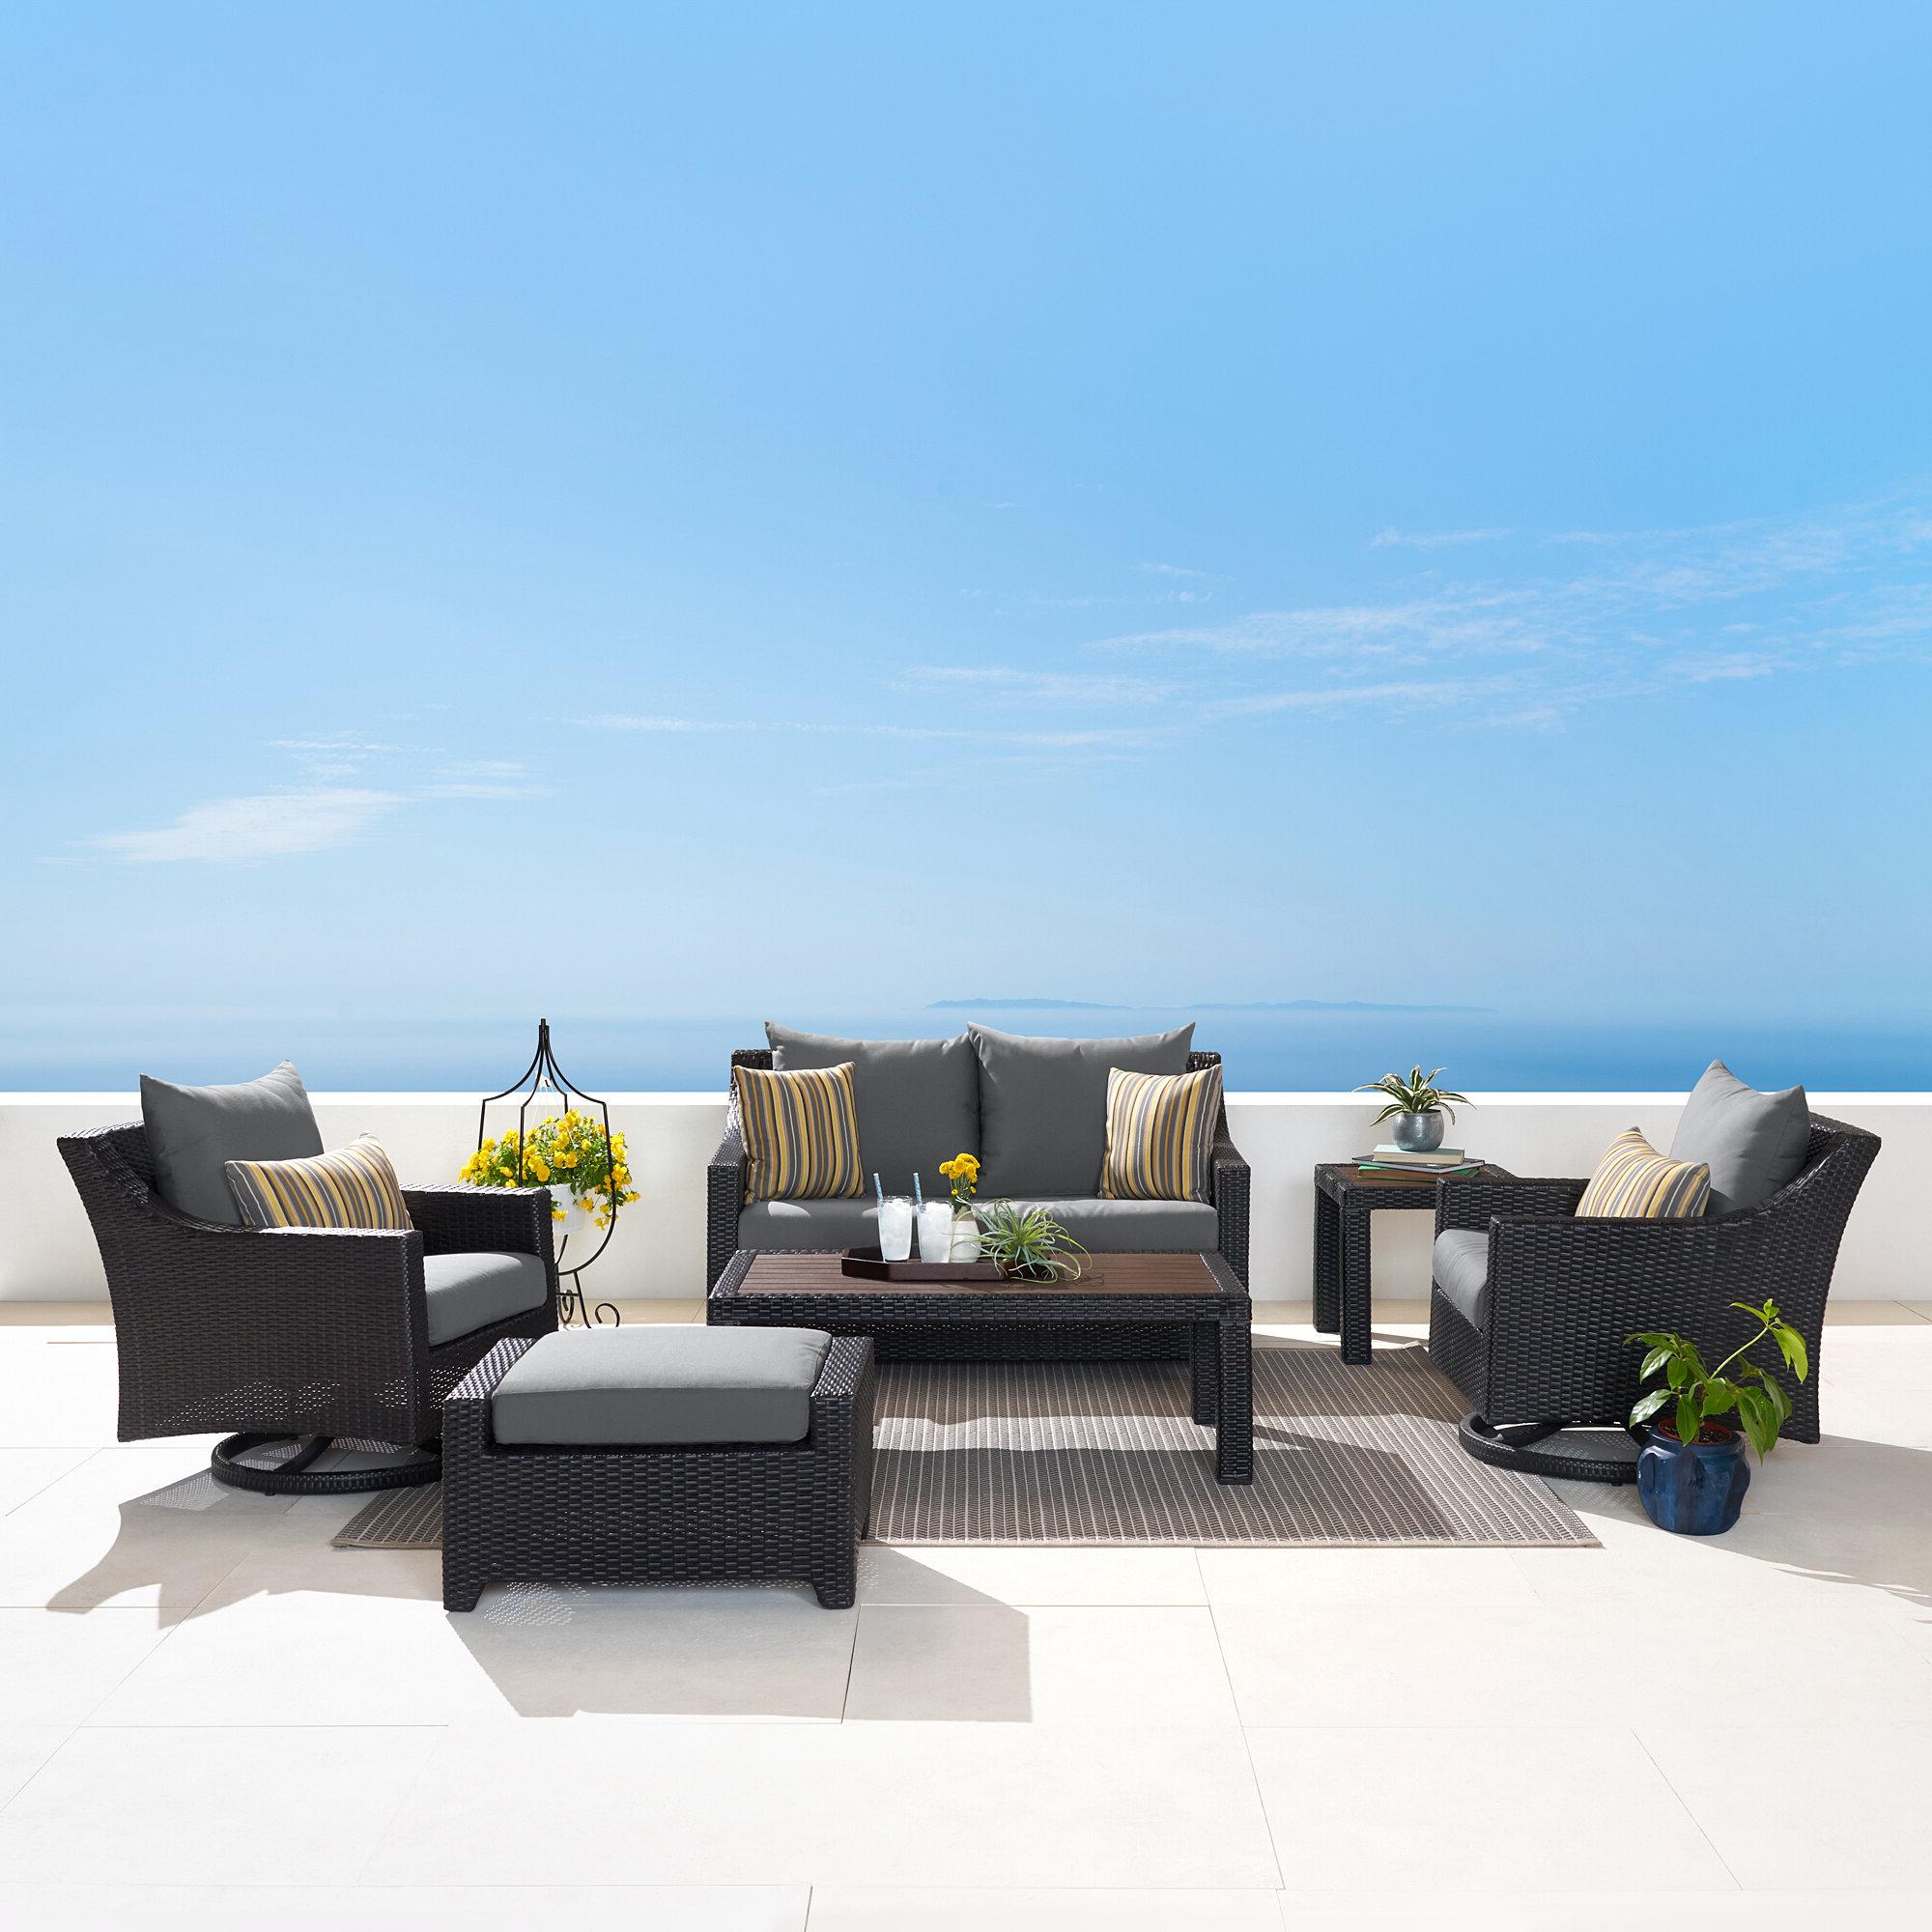 Northridge 6 Piece Sunbrella Sofa Set With Cushions Inside Current Northridge Patio Sofas With Sunbrella Cushions (View 2 of 20)